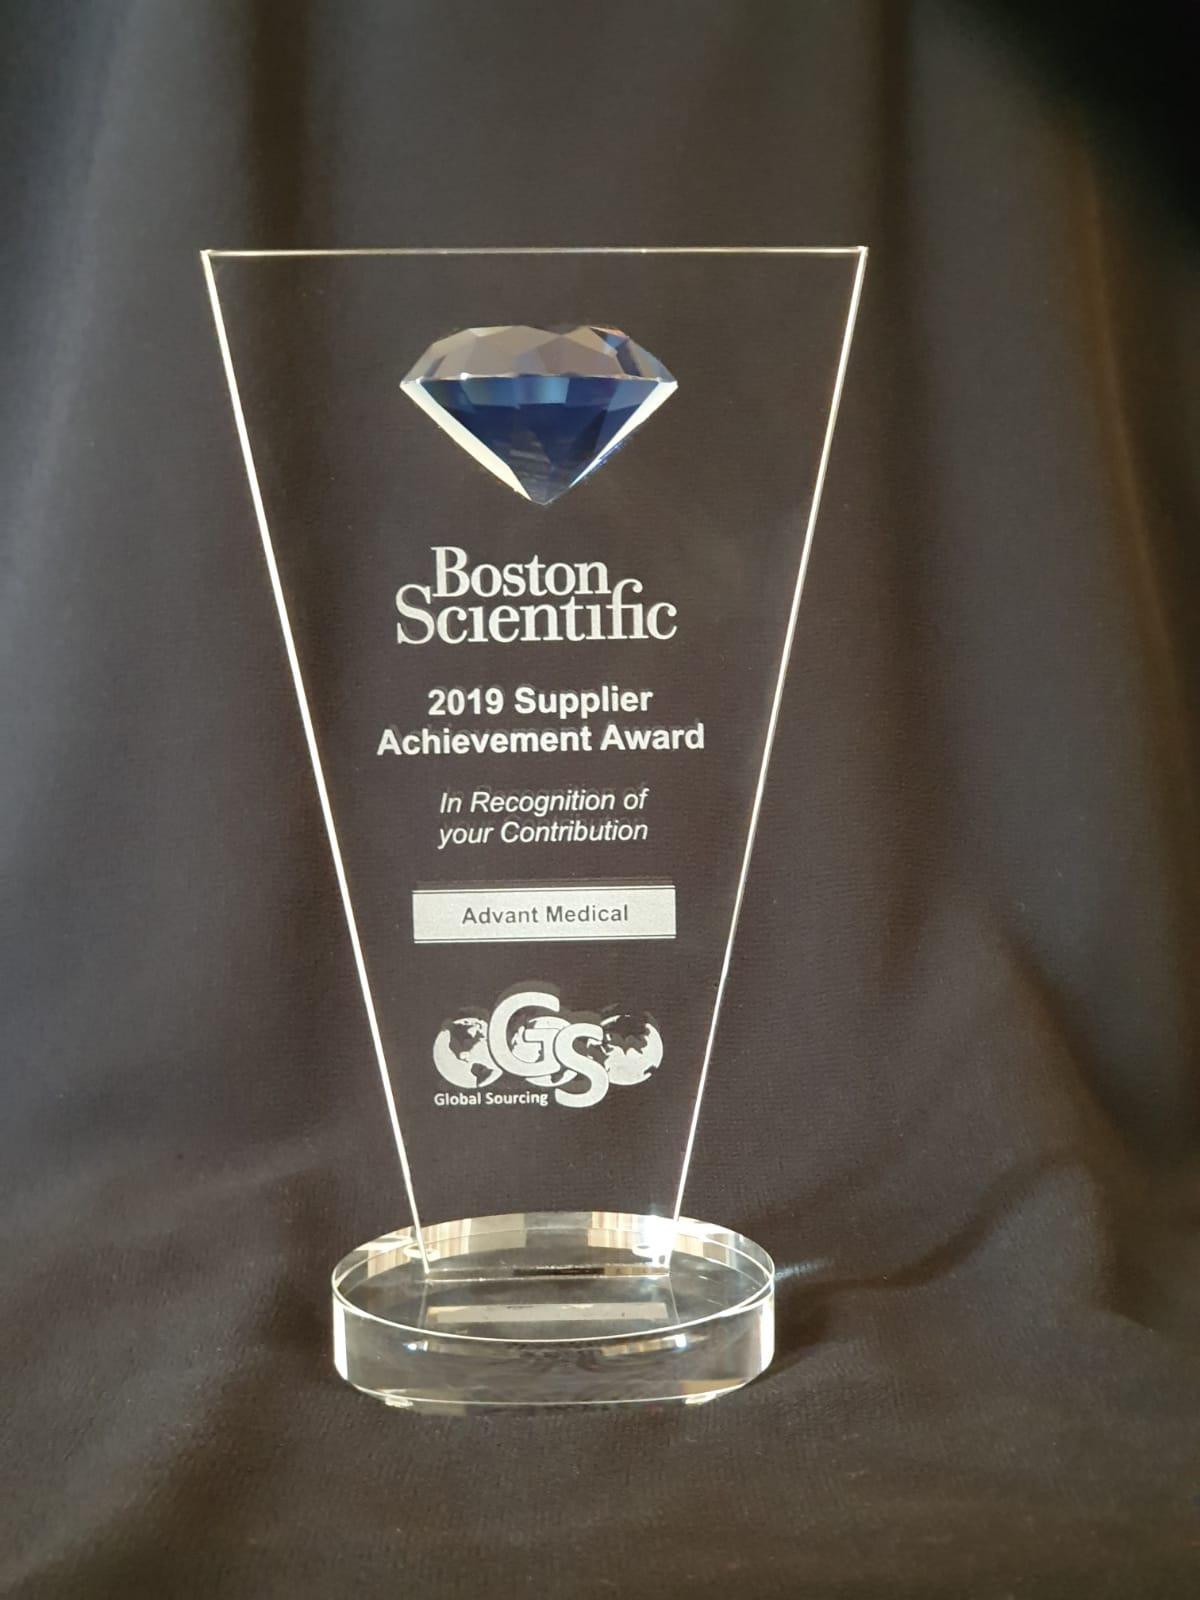 Advant Medical - Advant Medical Awarded 2019 Global Supplier Achievement Award from Boston Scientific